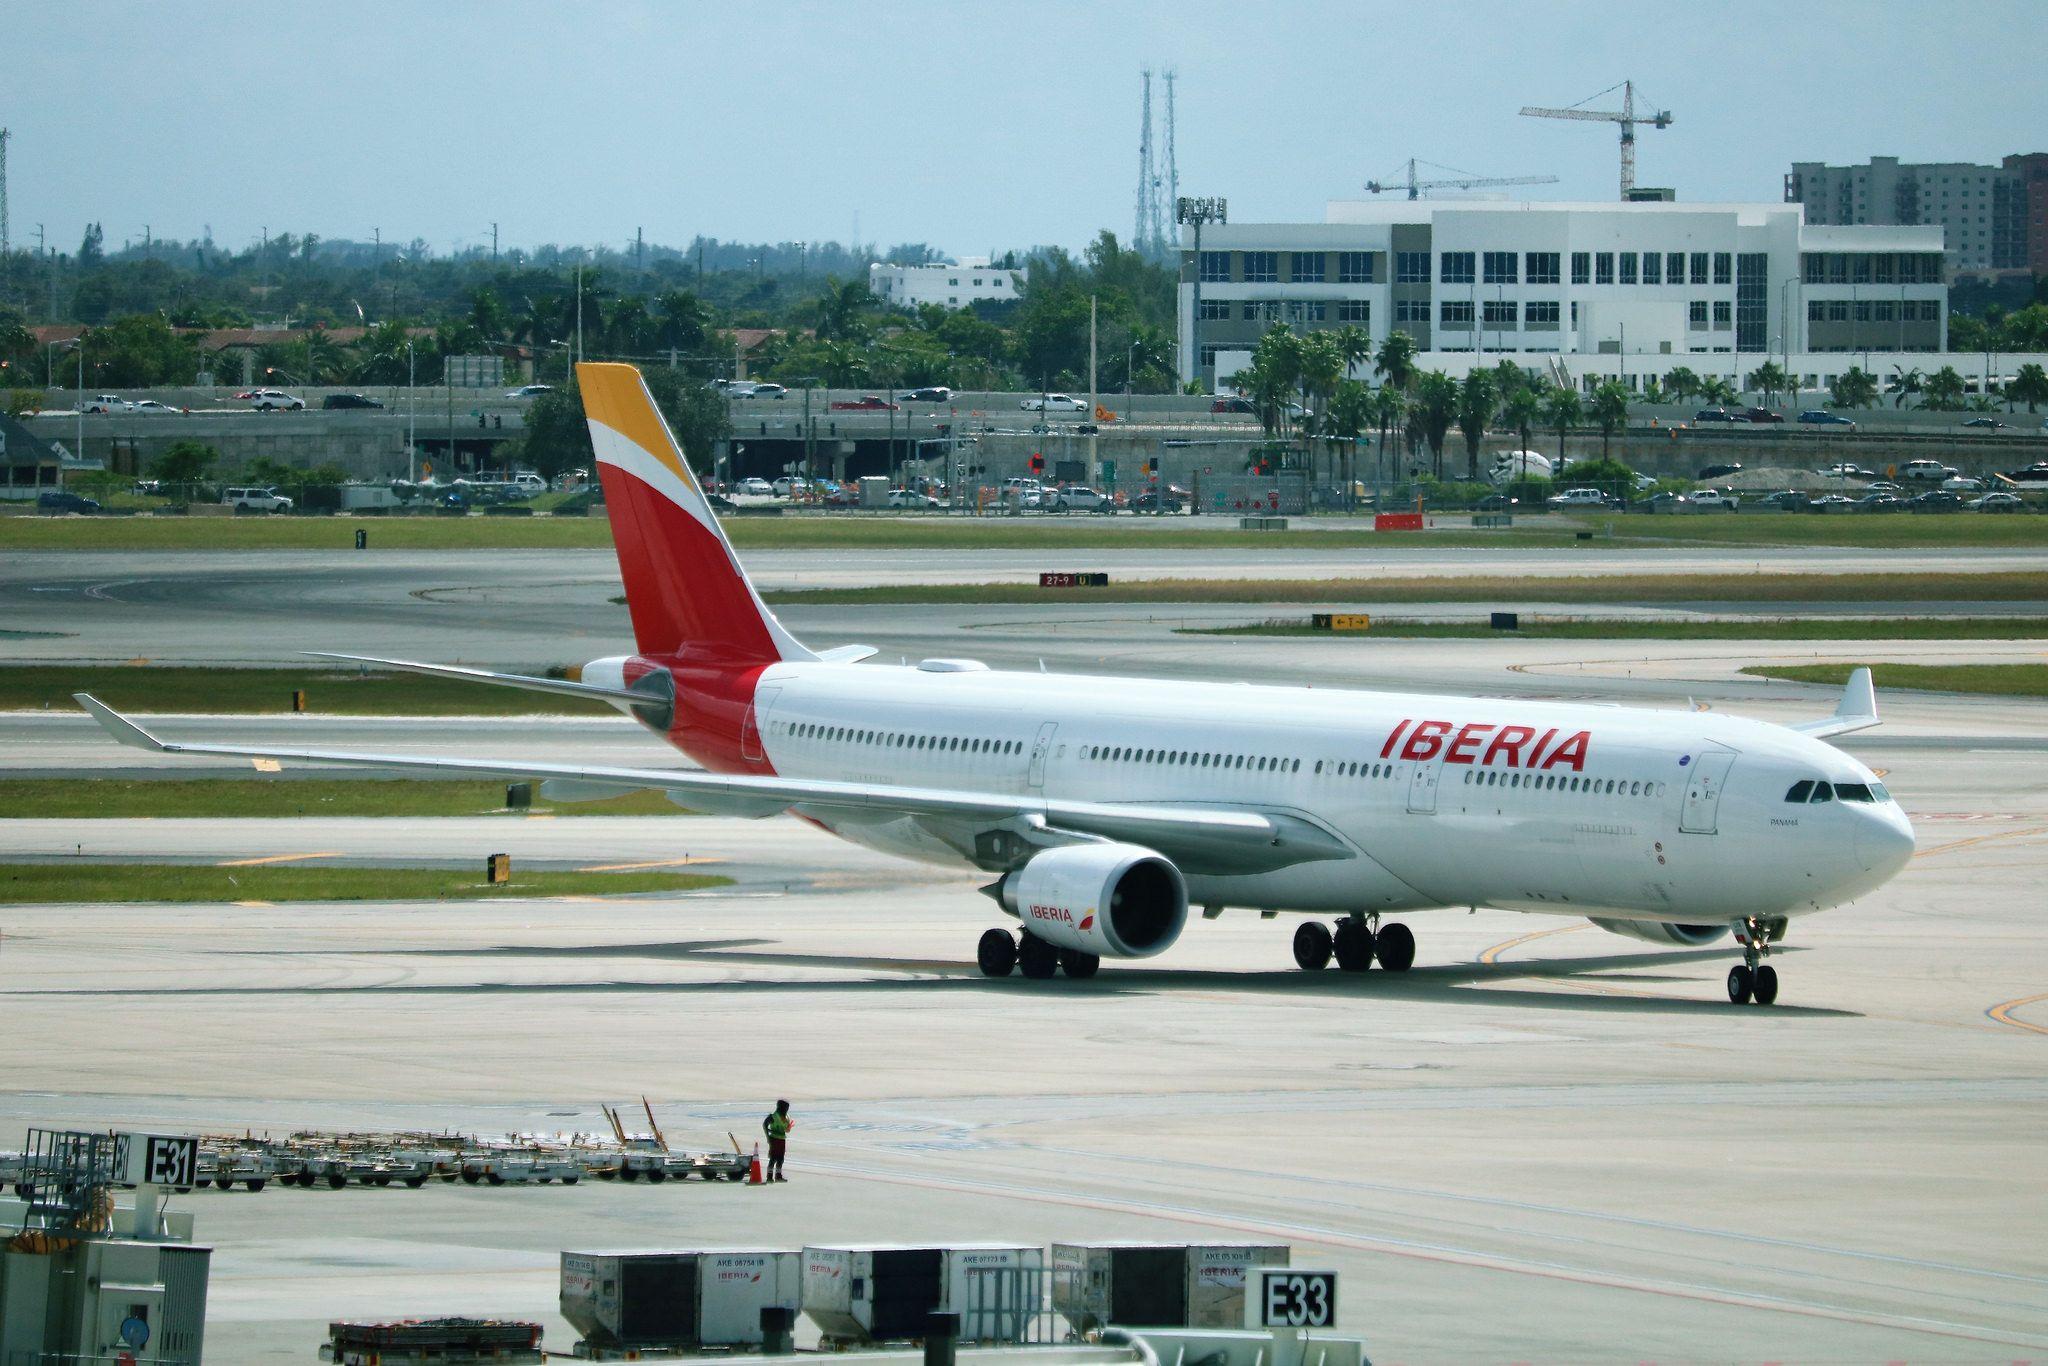 Iberia A330 Jet, Aircraft, Vehicles